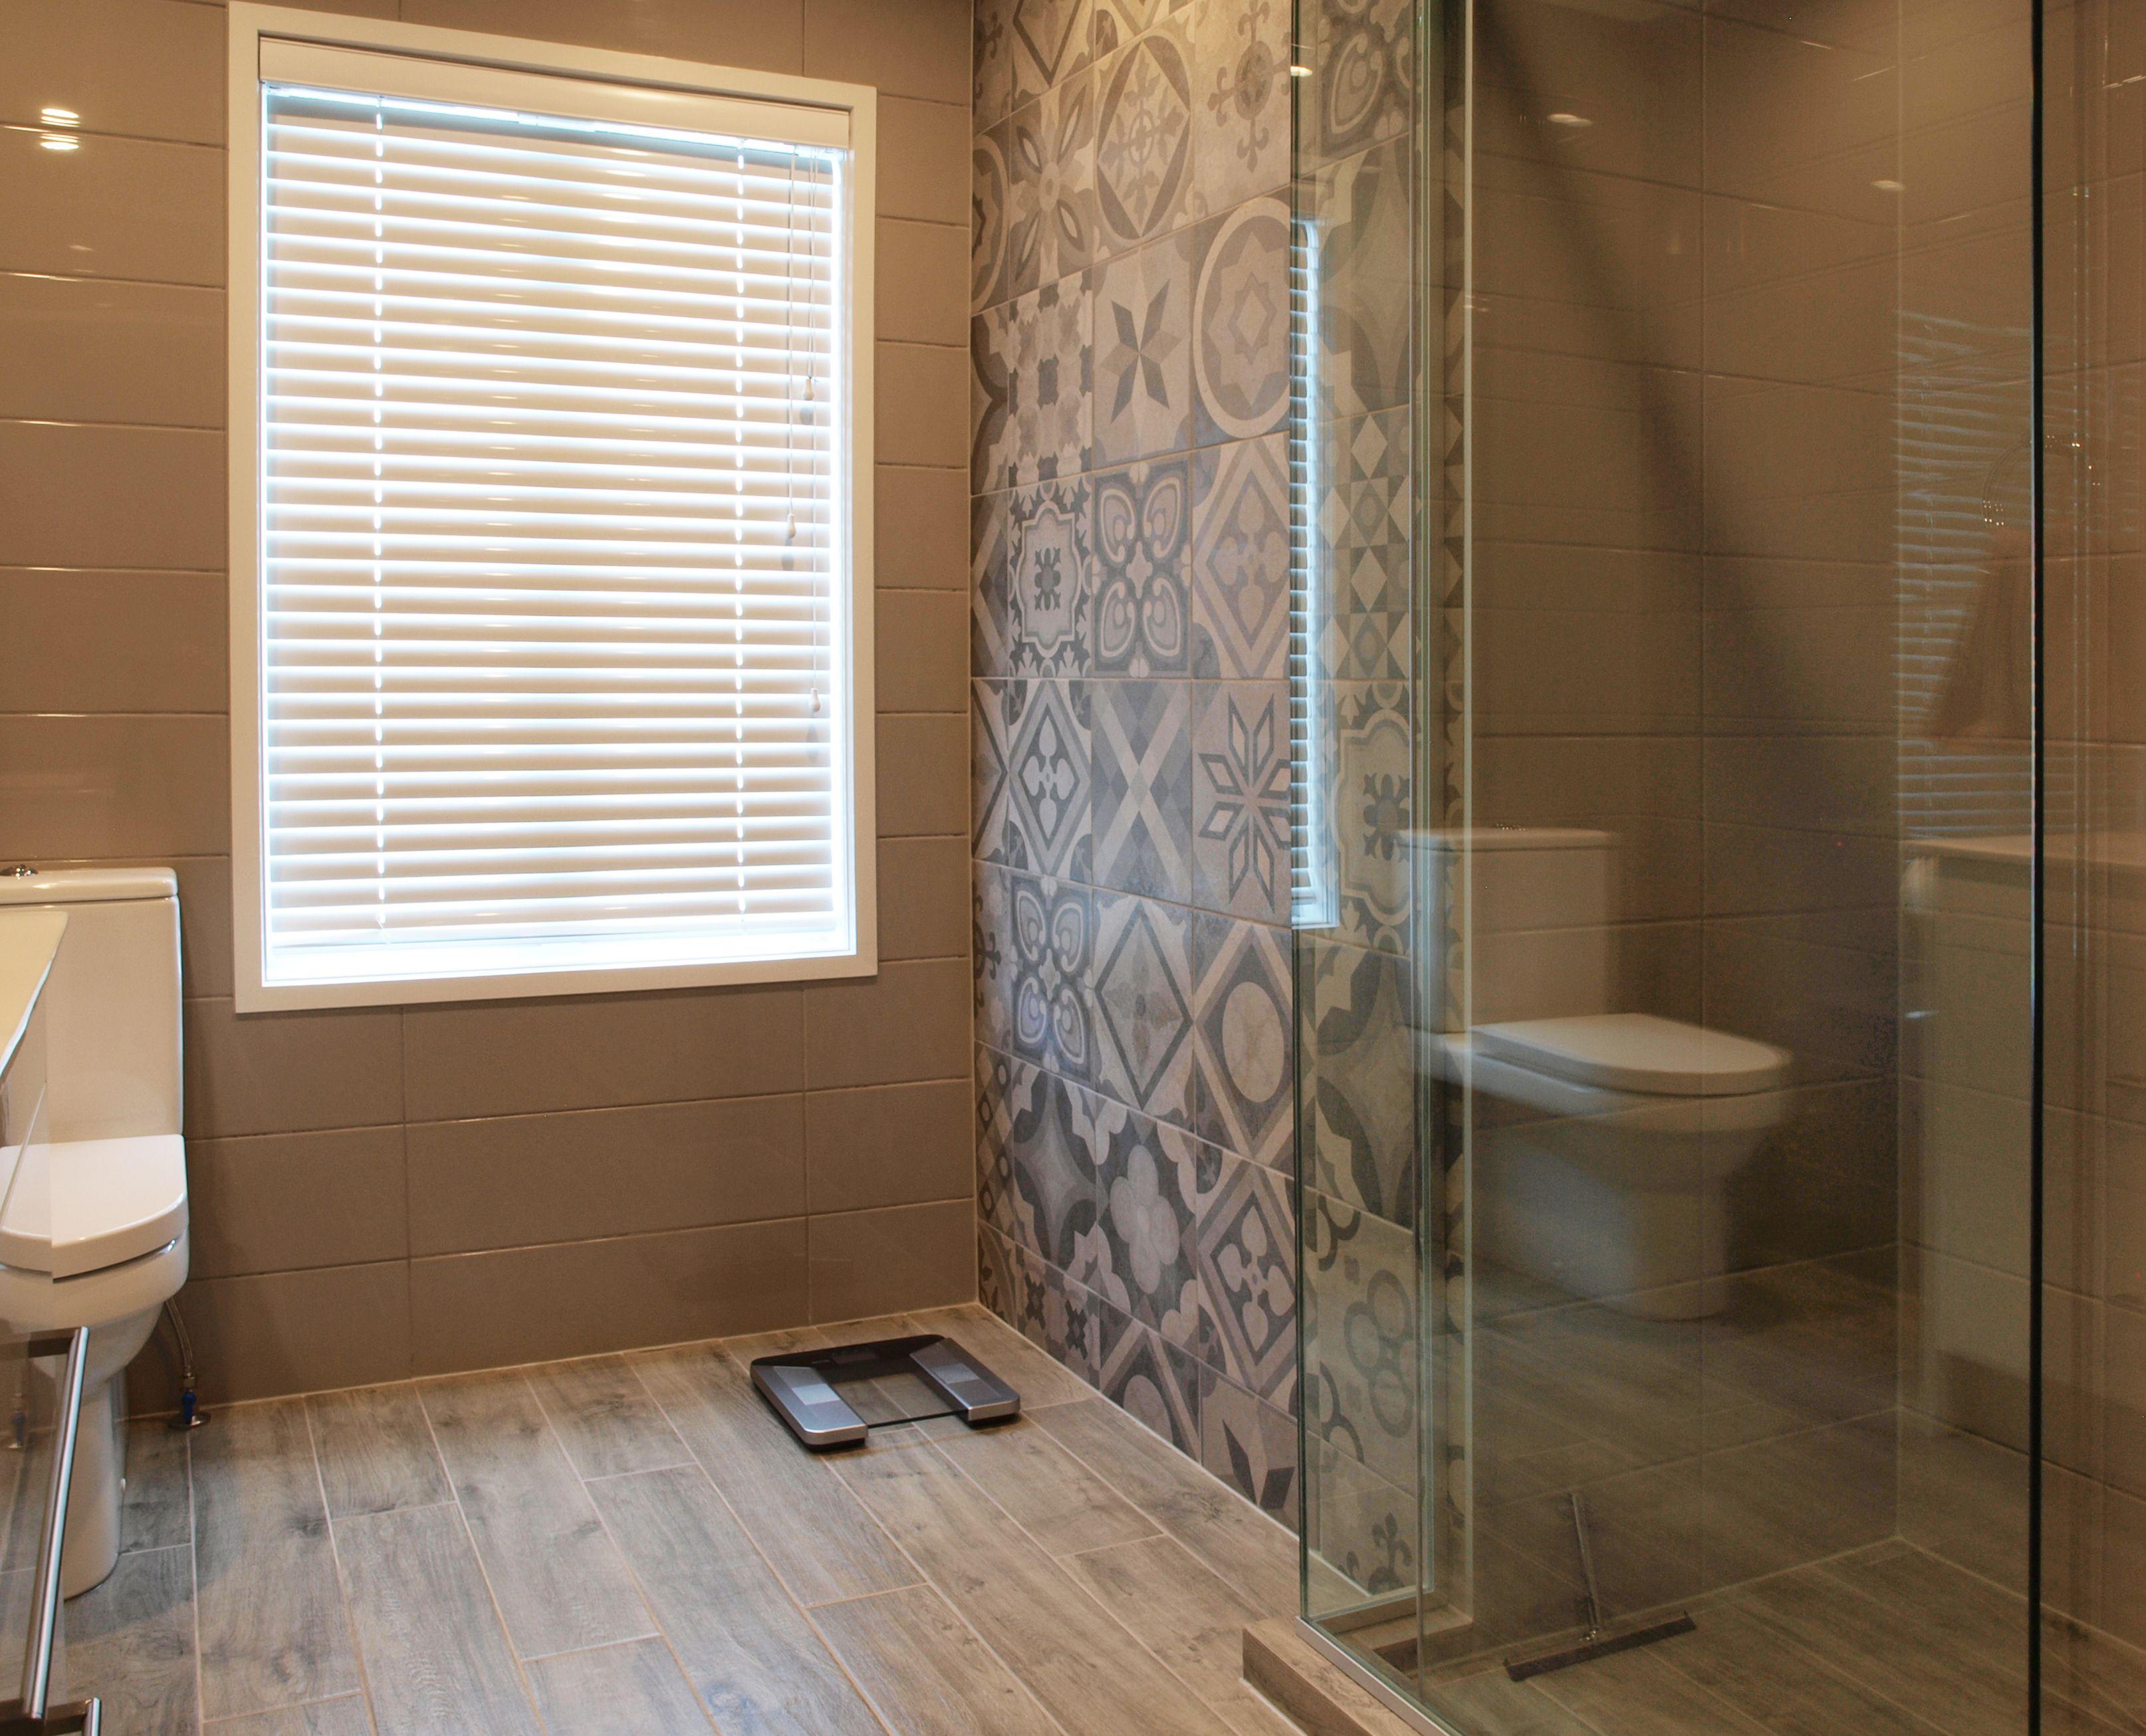 Gredos 30 patterned tile with wood look tile floor. #bathroom #tiles ...